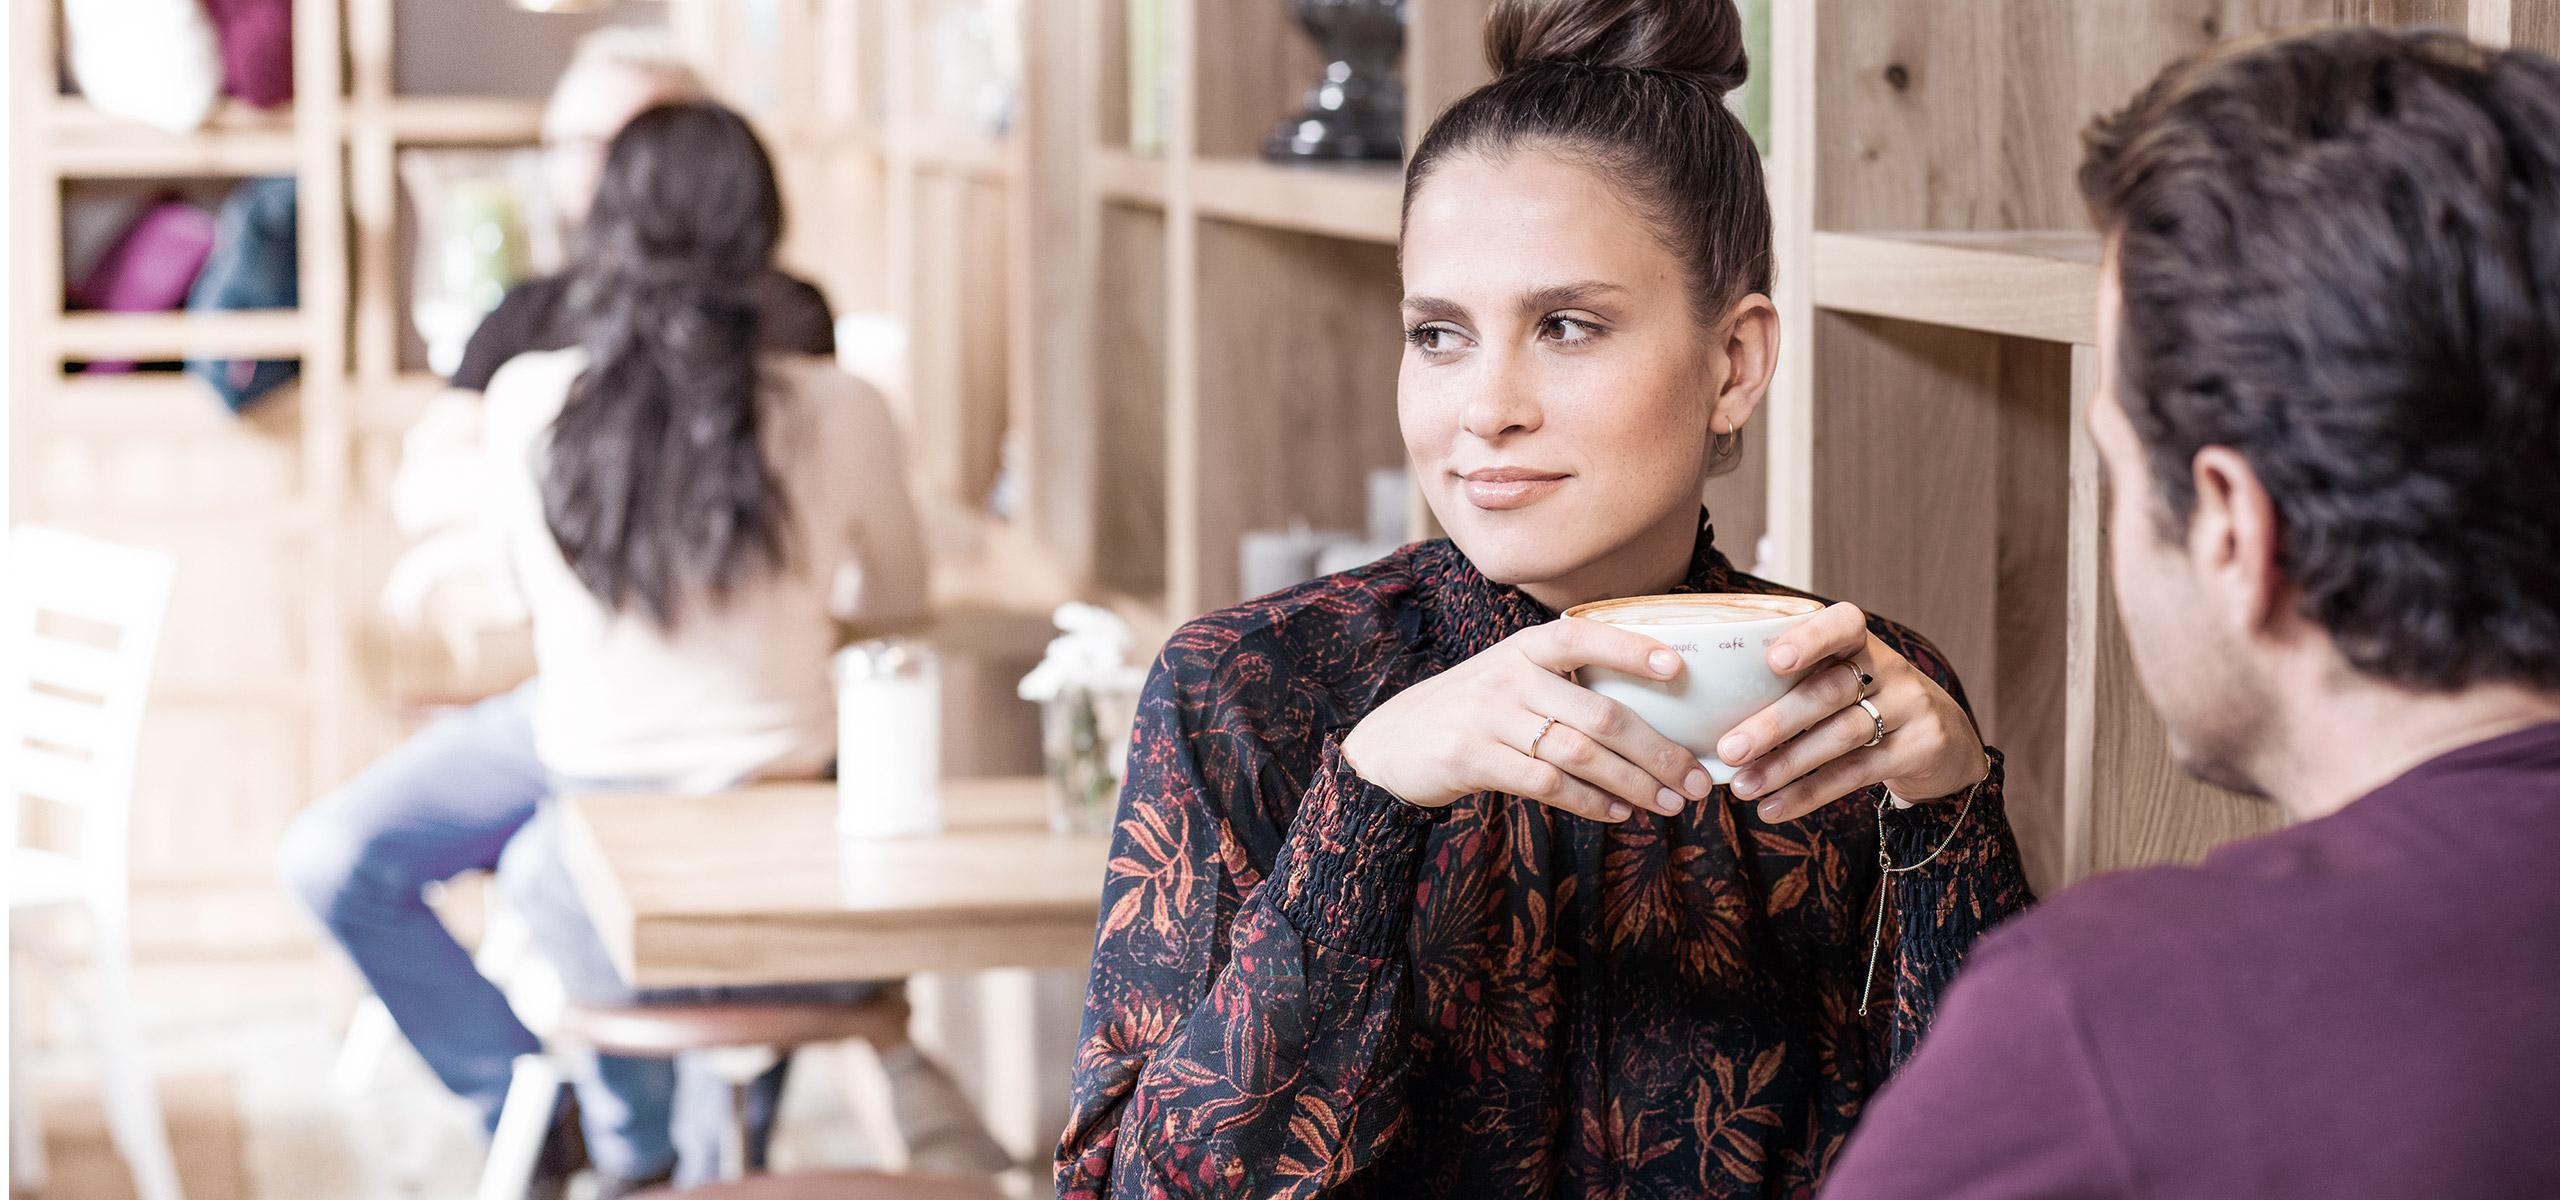 BRITA Kaffee Paar trinken Kaffee